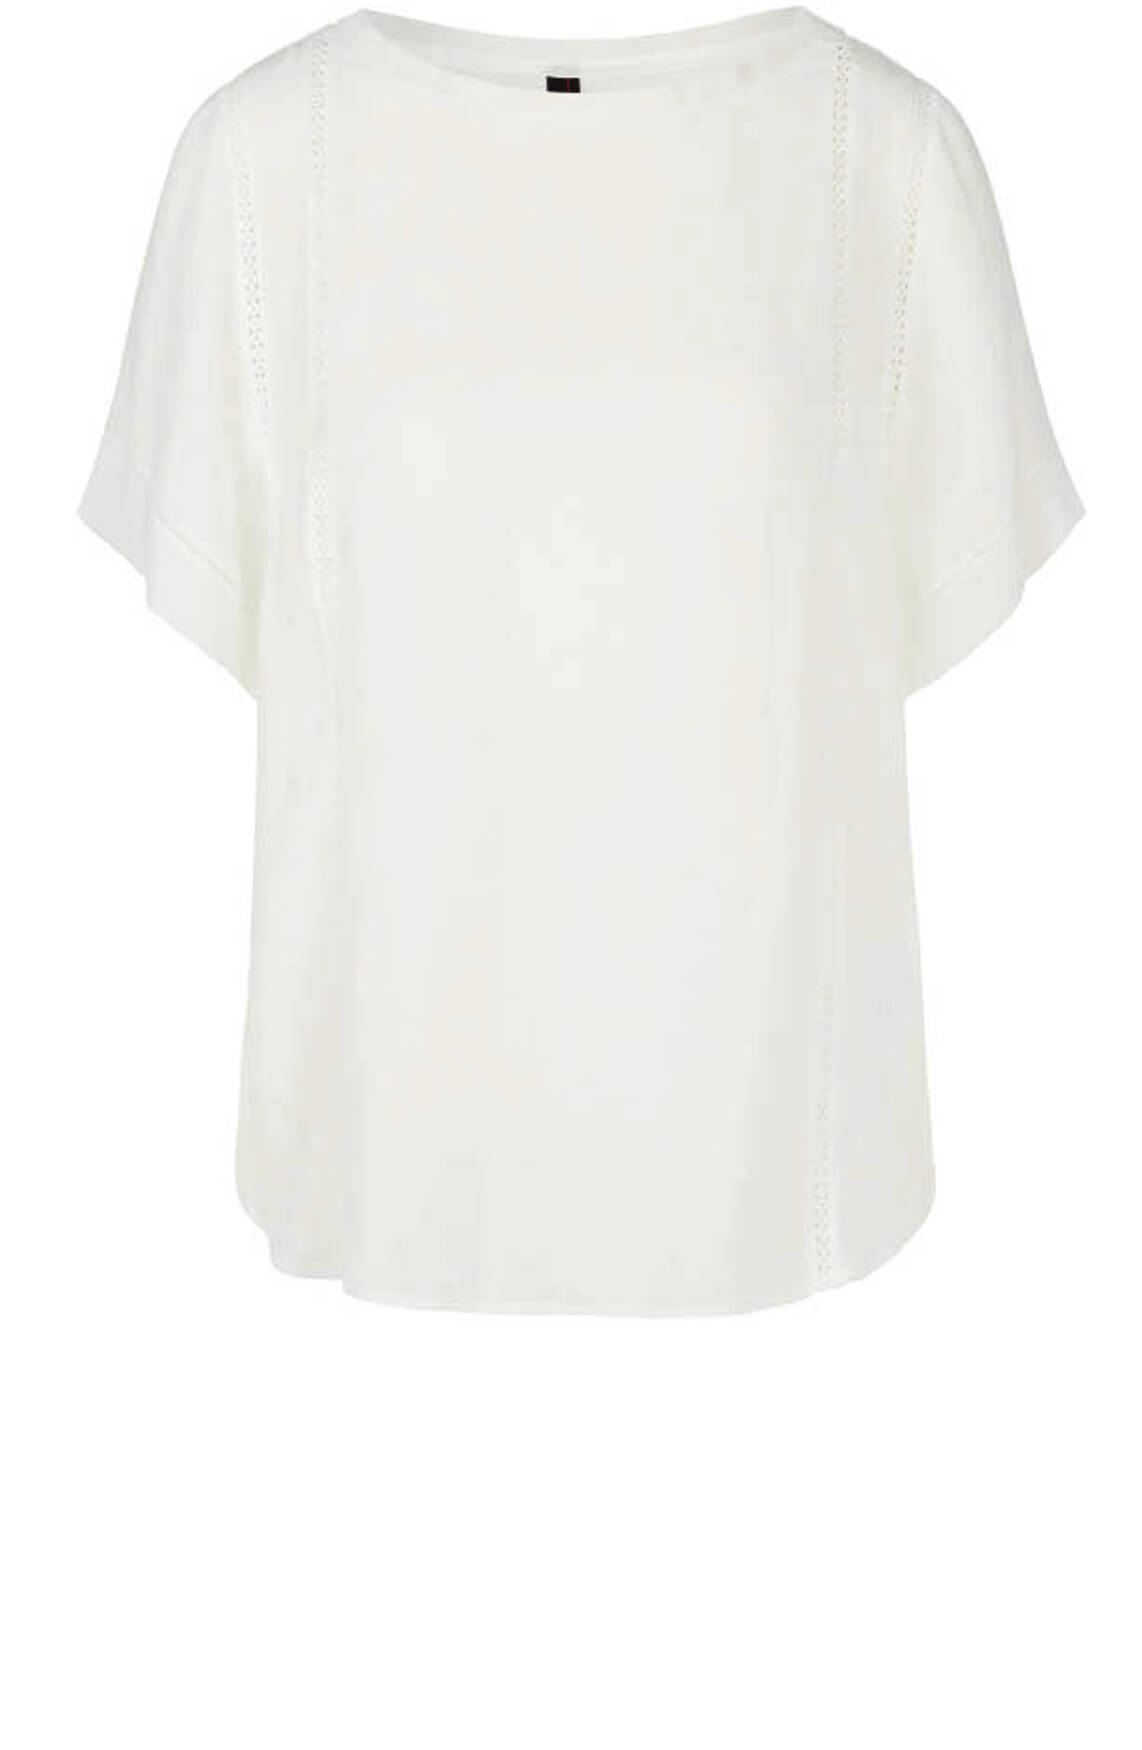 Marccain Dames Blouseshirt met kant wit